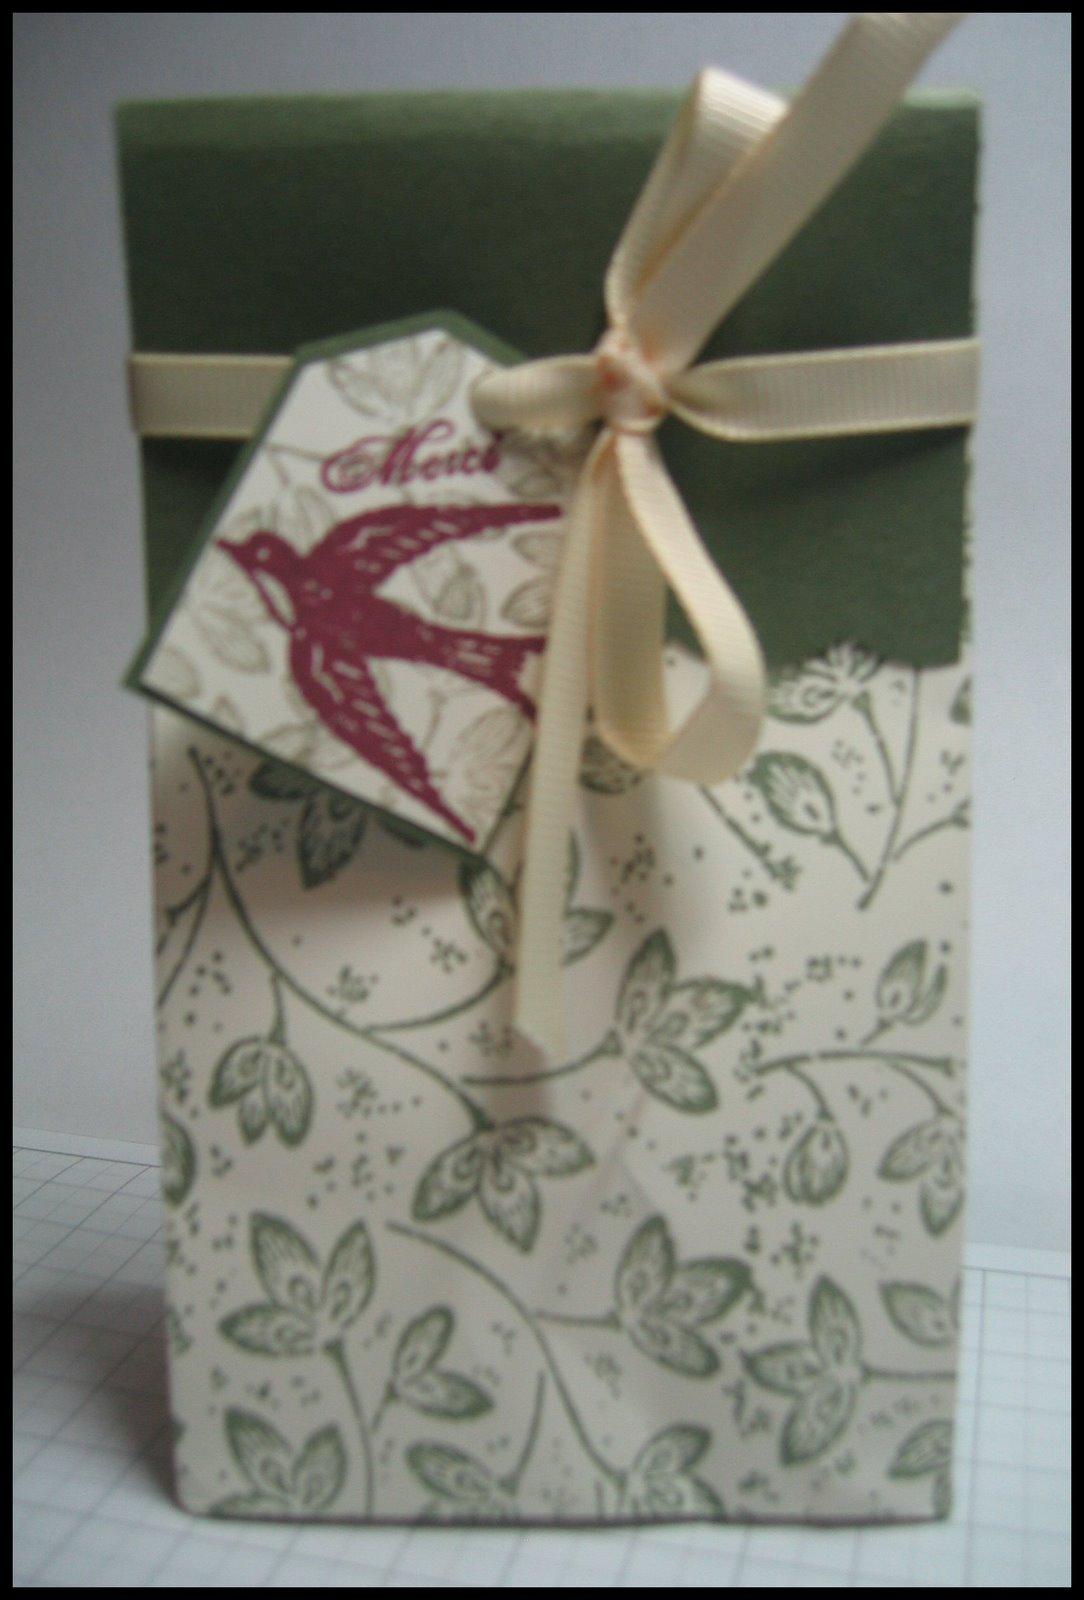 [carte+postal+bag+a+lope]